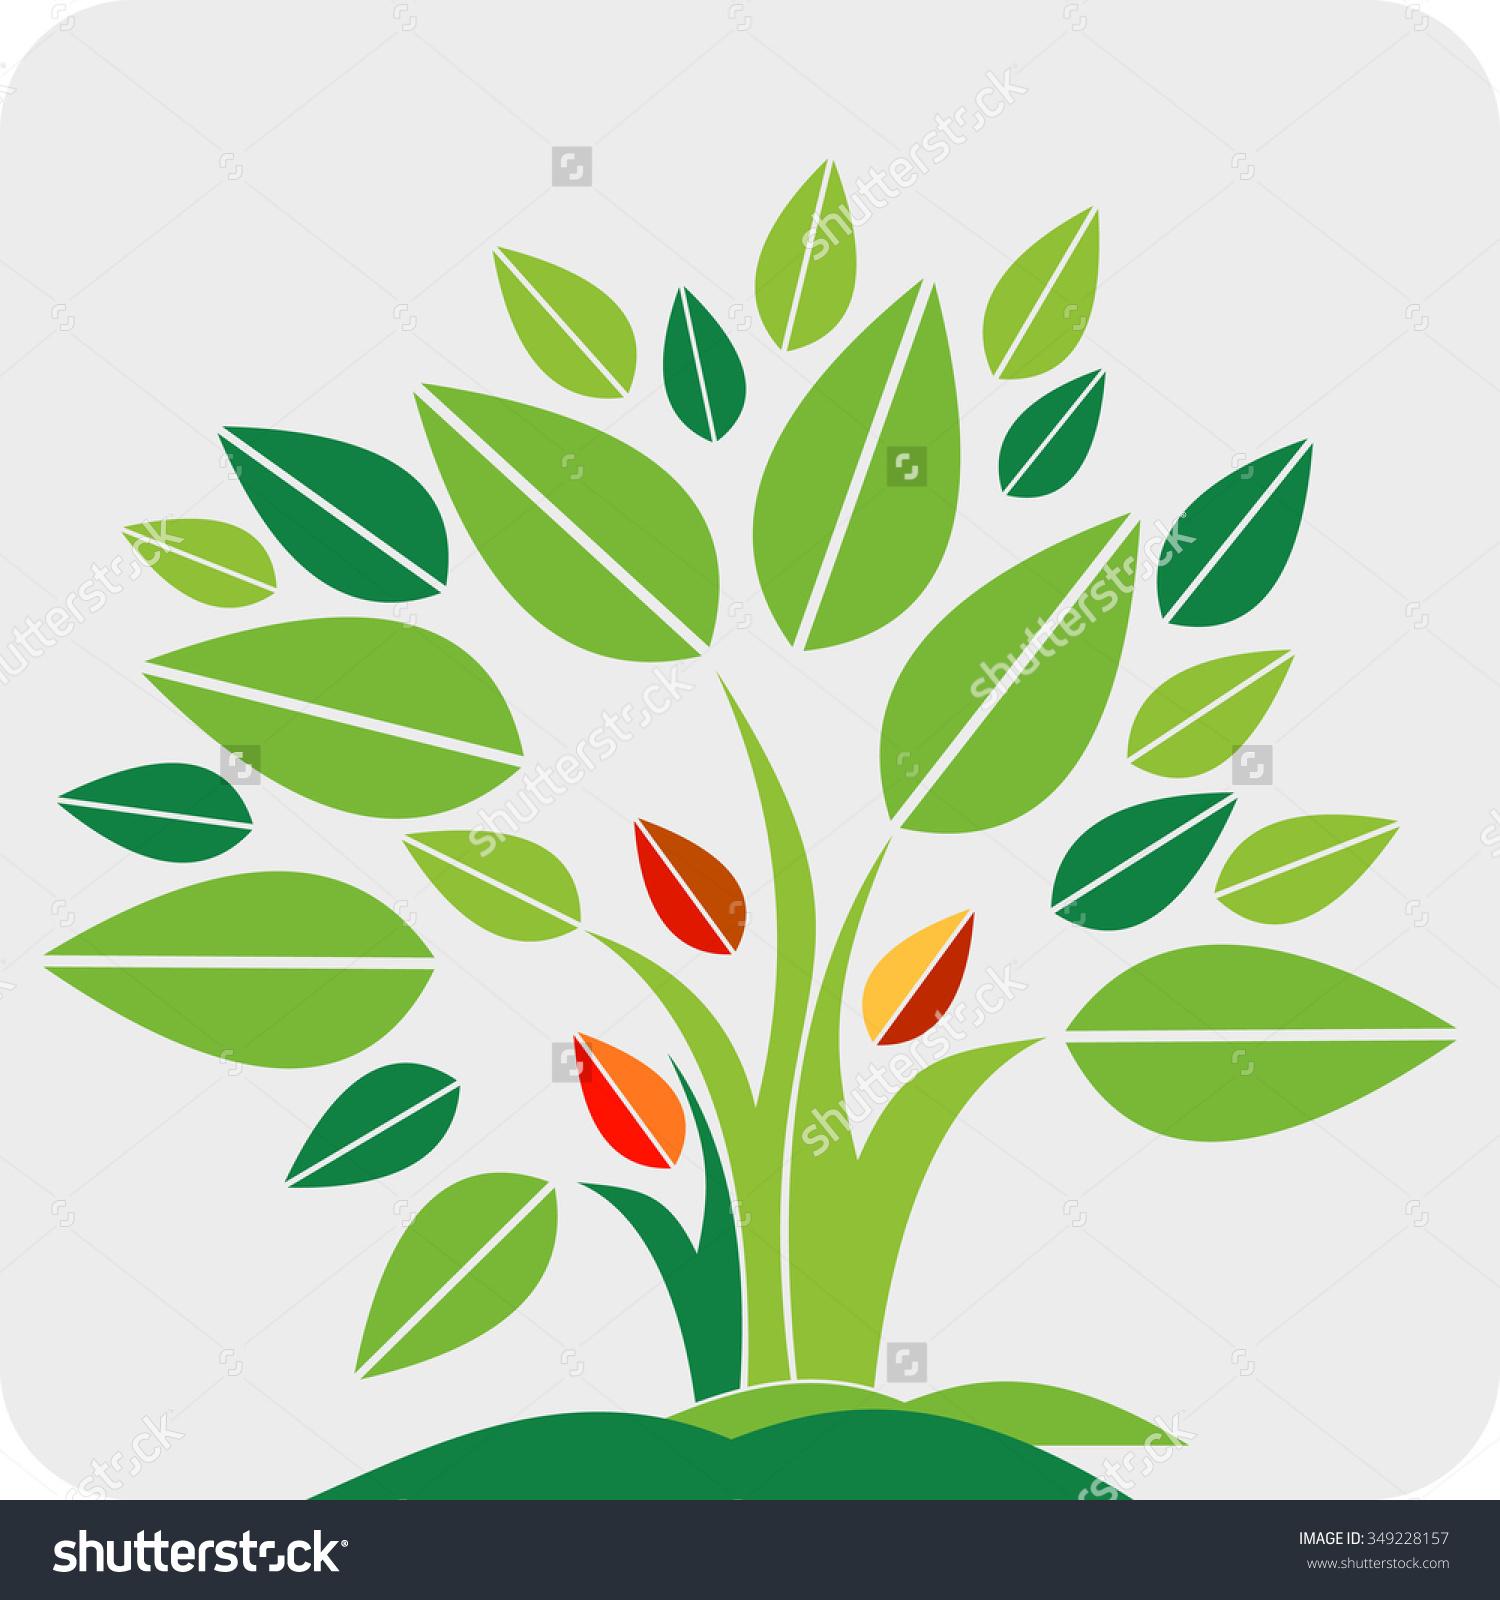 Clipart Teamwork People Tree Logo Icon Stock Vector 349228157.